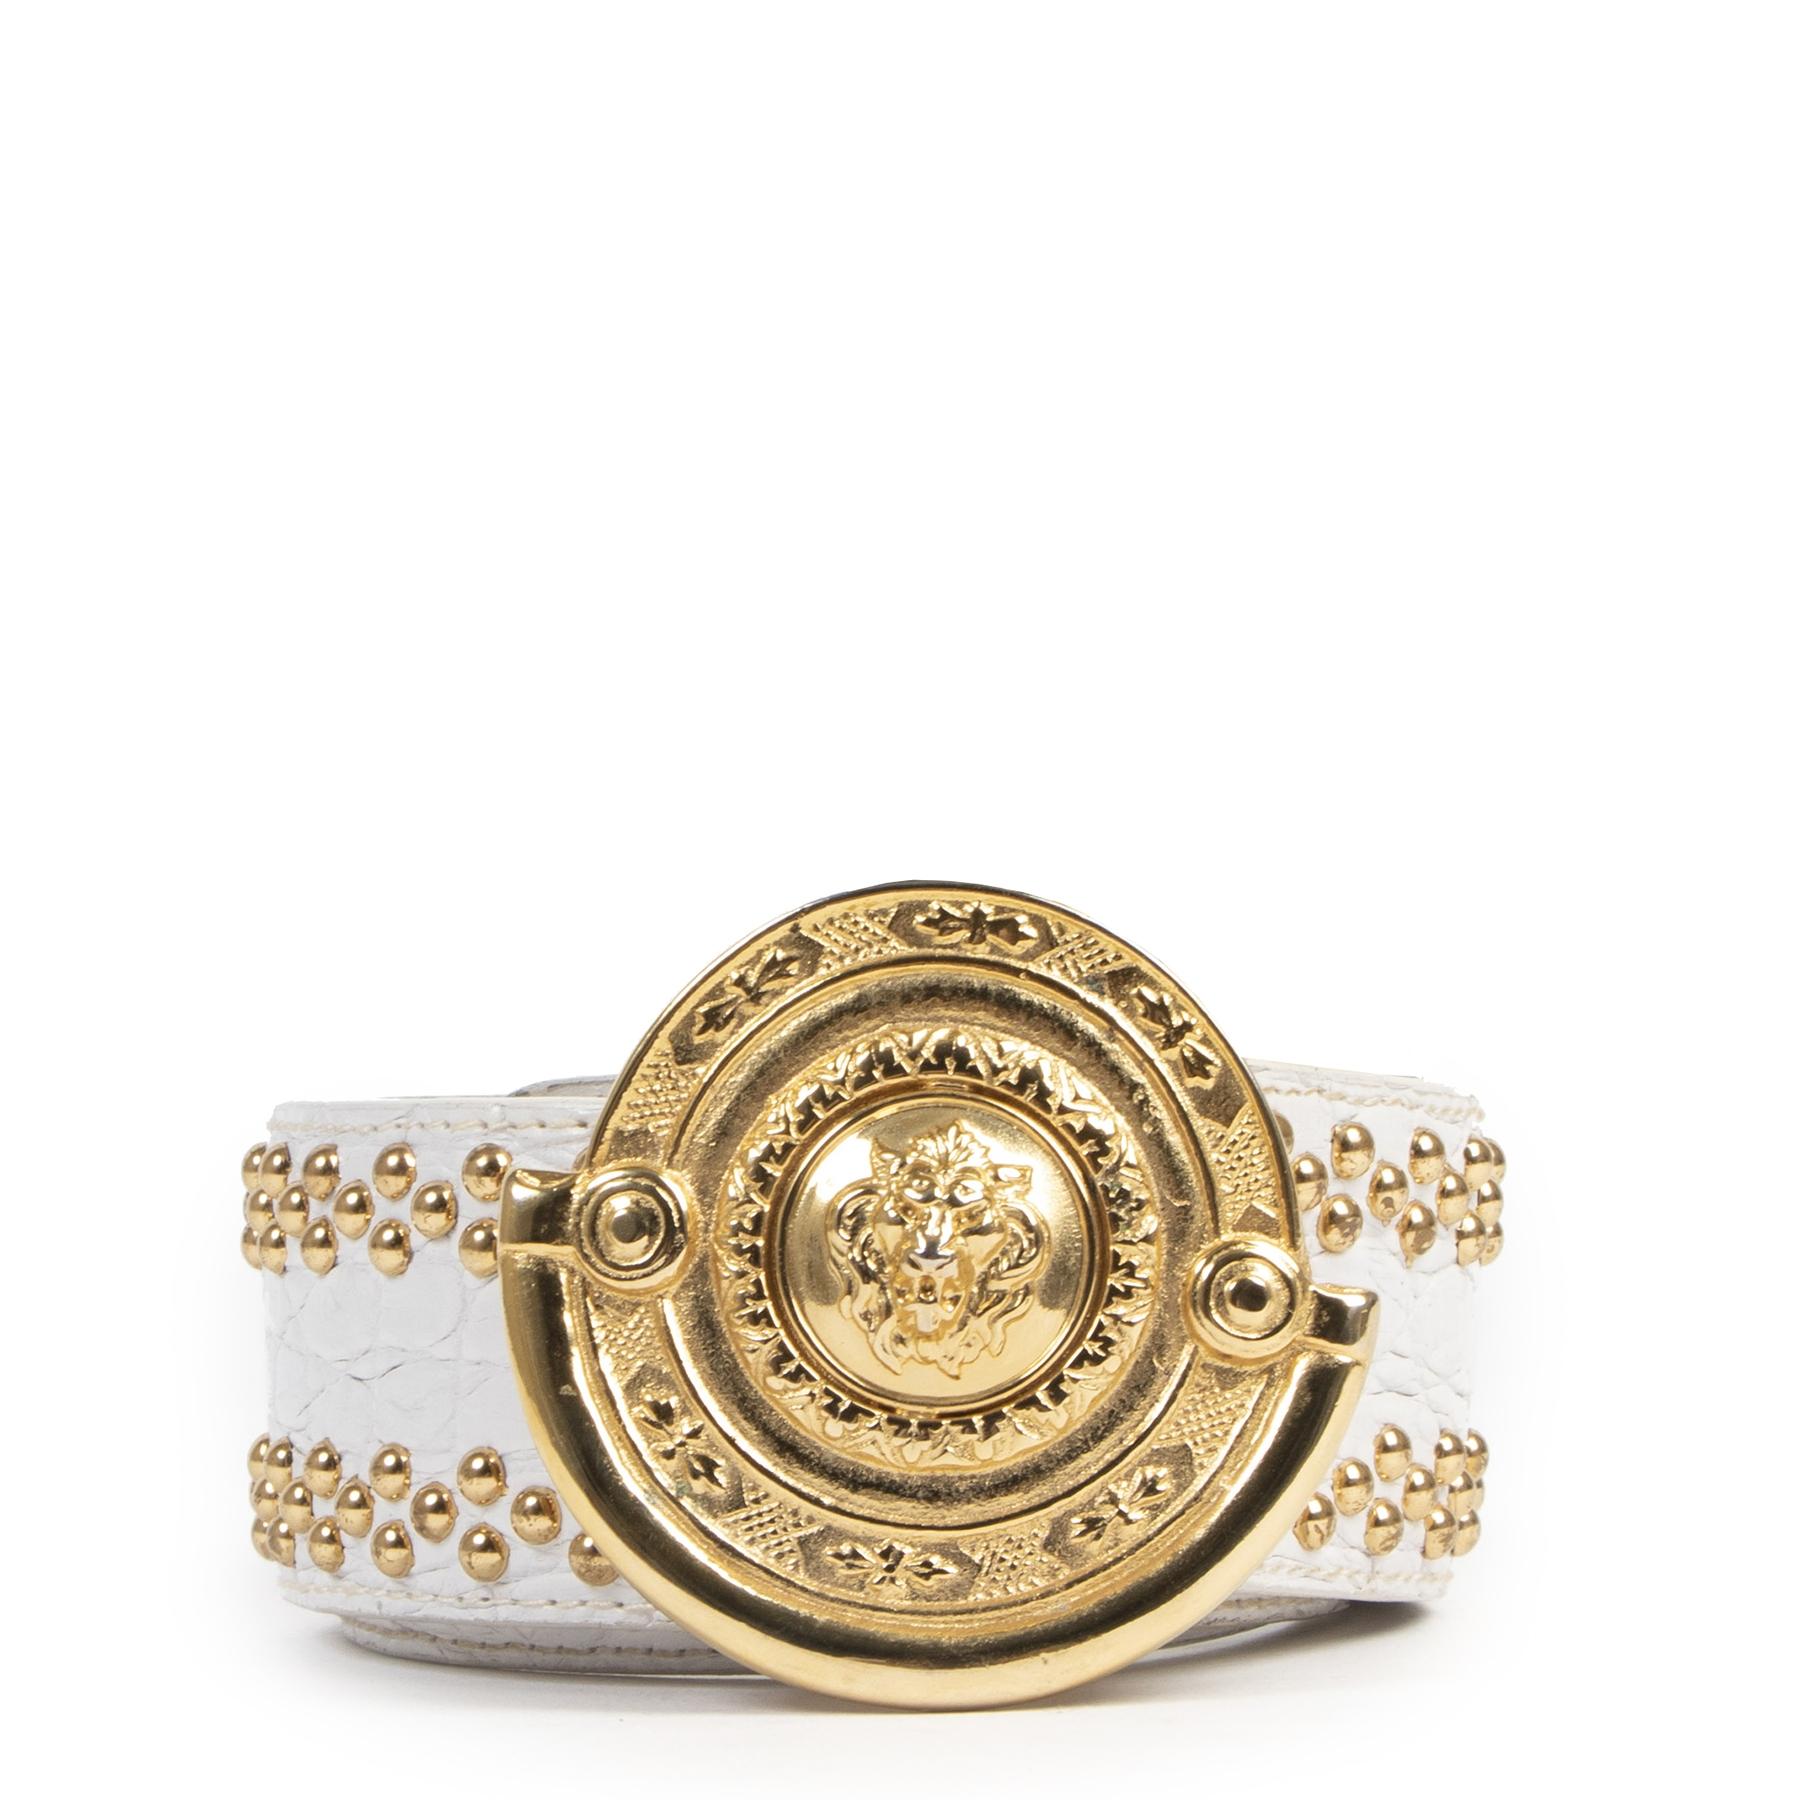 Authentic secondhand Versus Versace White Gold Studded Belt - Size 85 designer accessories fashion luxury vintage webshop designer brands safe secure online shopping